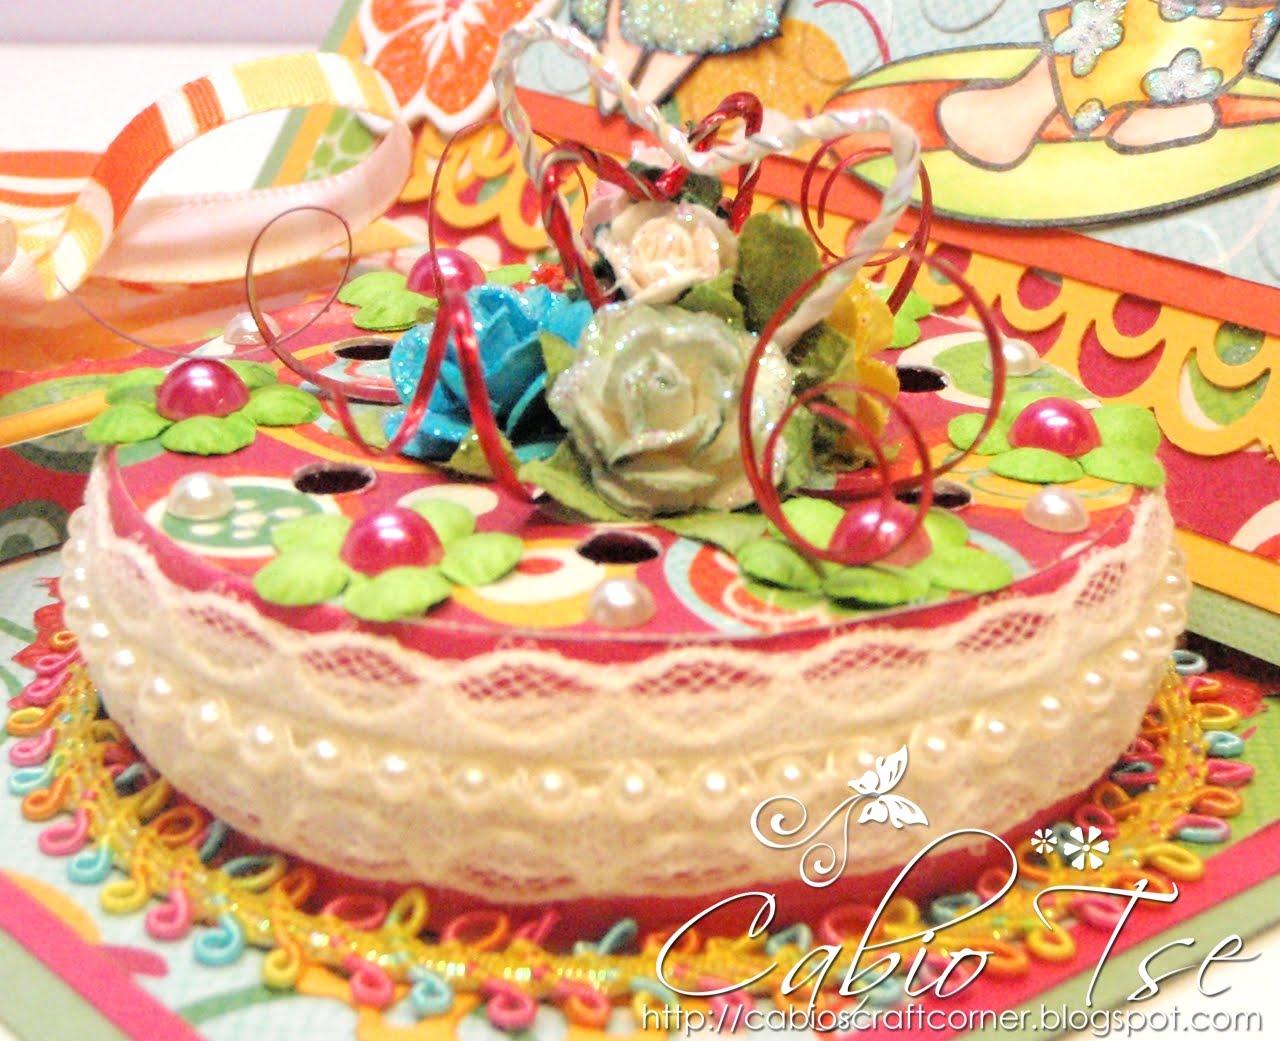 Cabio's Craft Corner: Tropical Hawaiian Wedding Cake Card